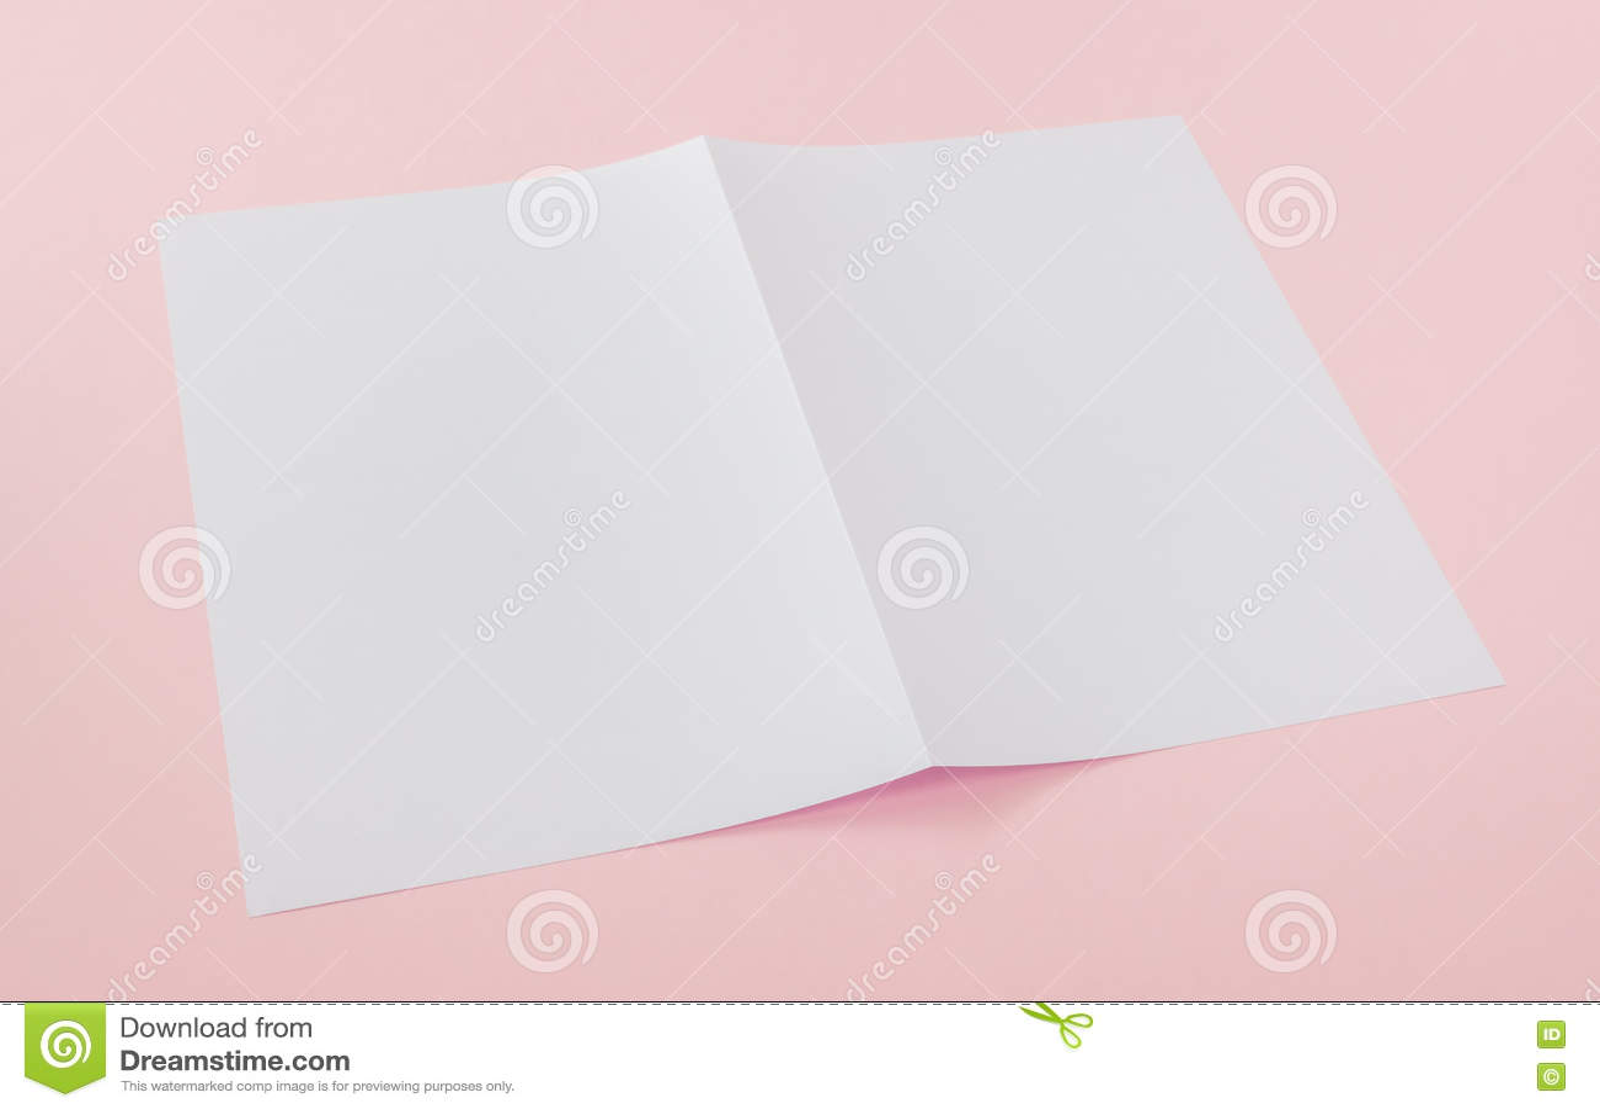 Download Bifold белая бумага шаблона Стоковое Изображение - изображение насчитывающей бумерангов, stationery: 72279143